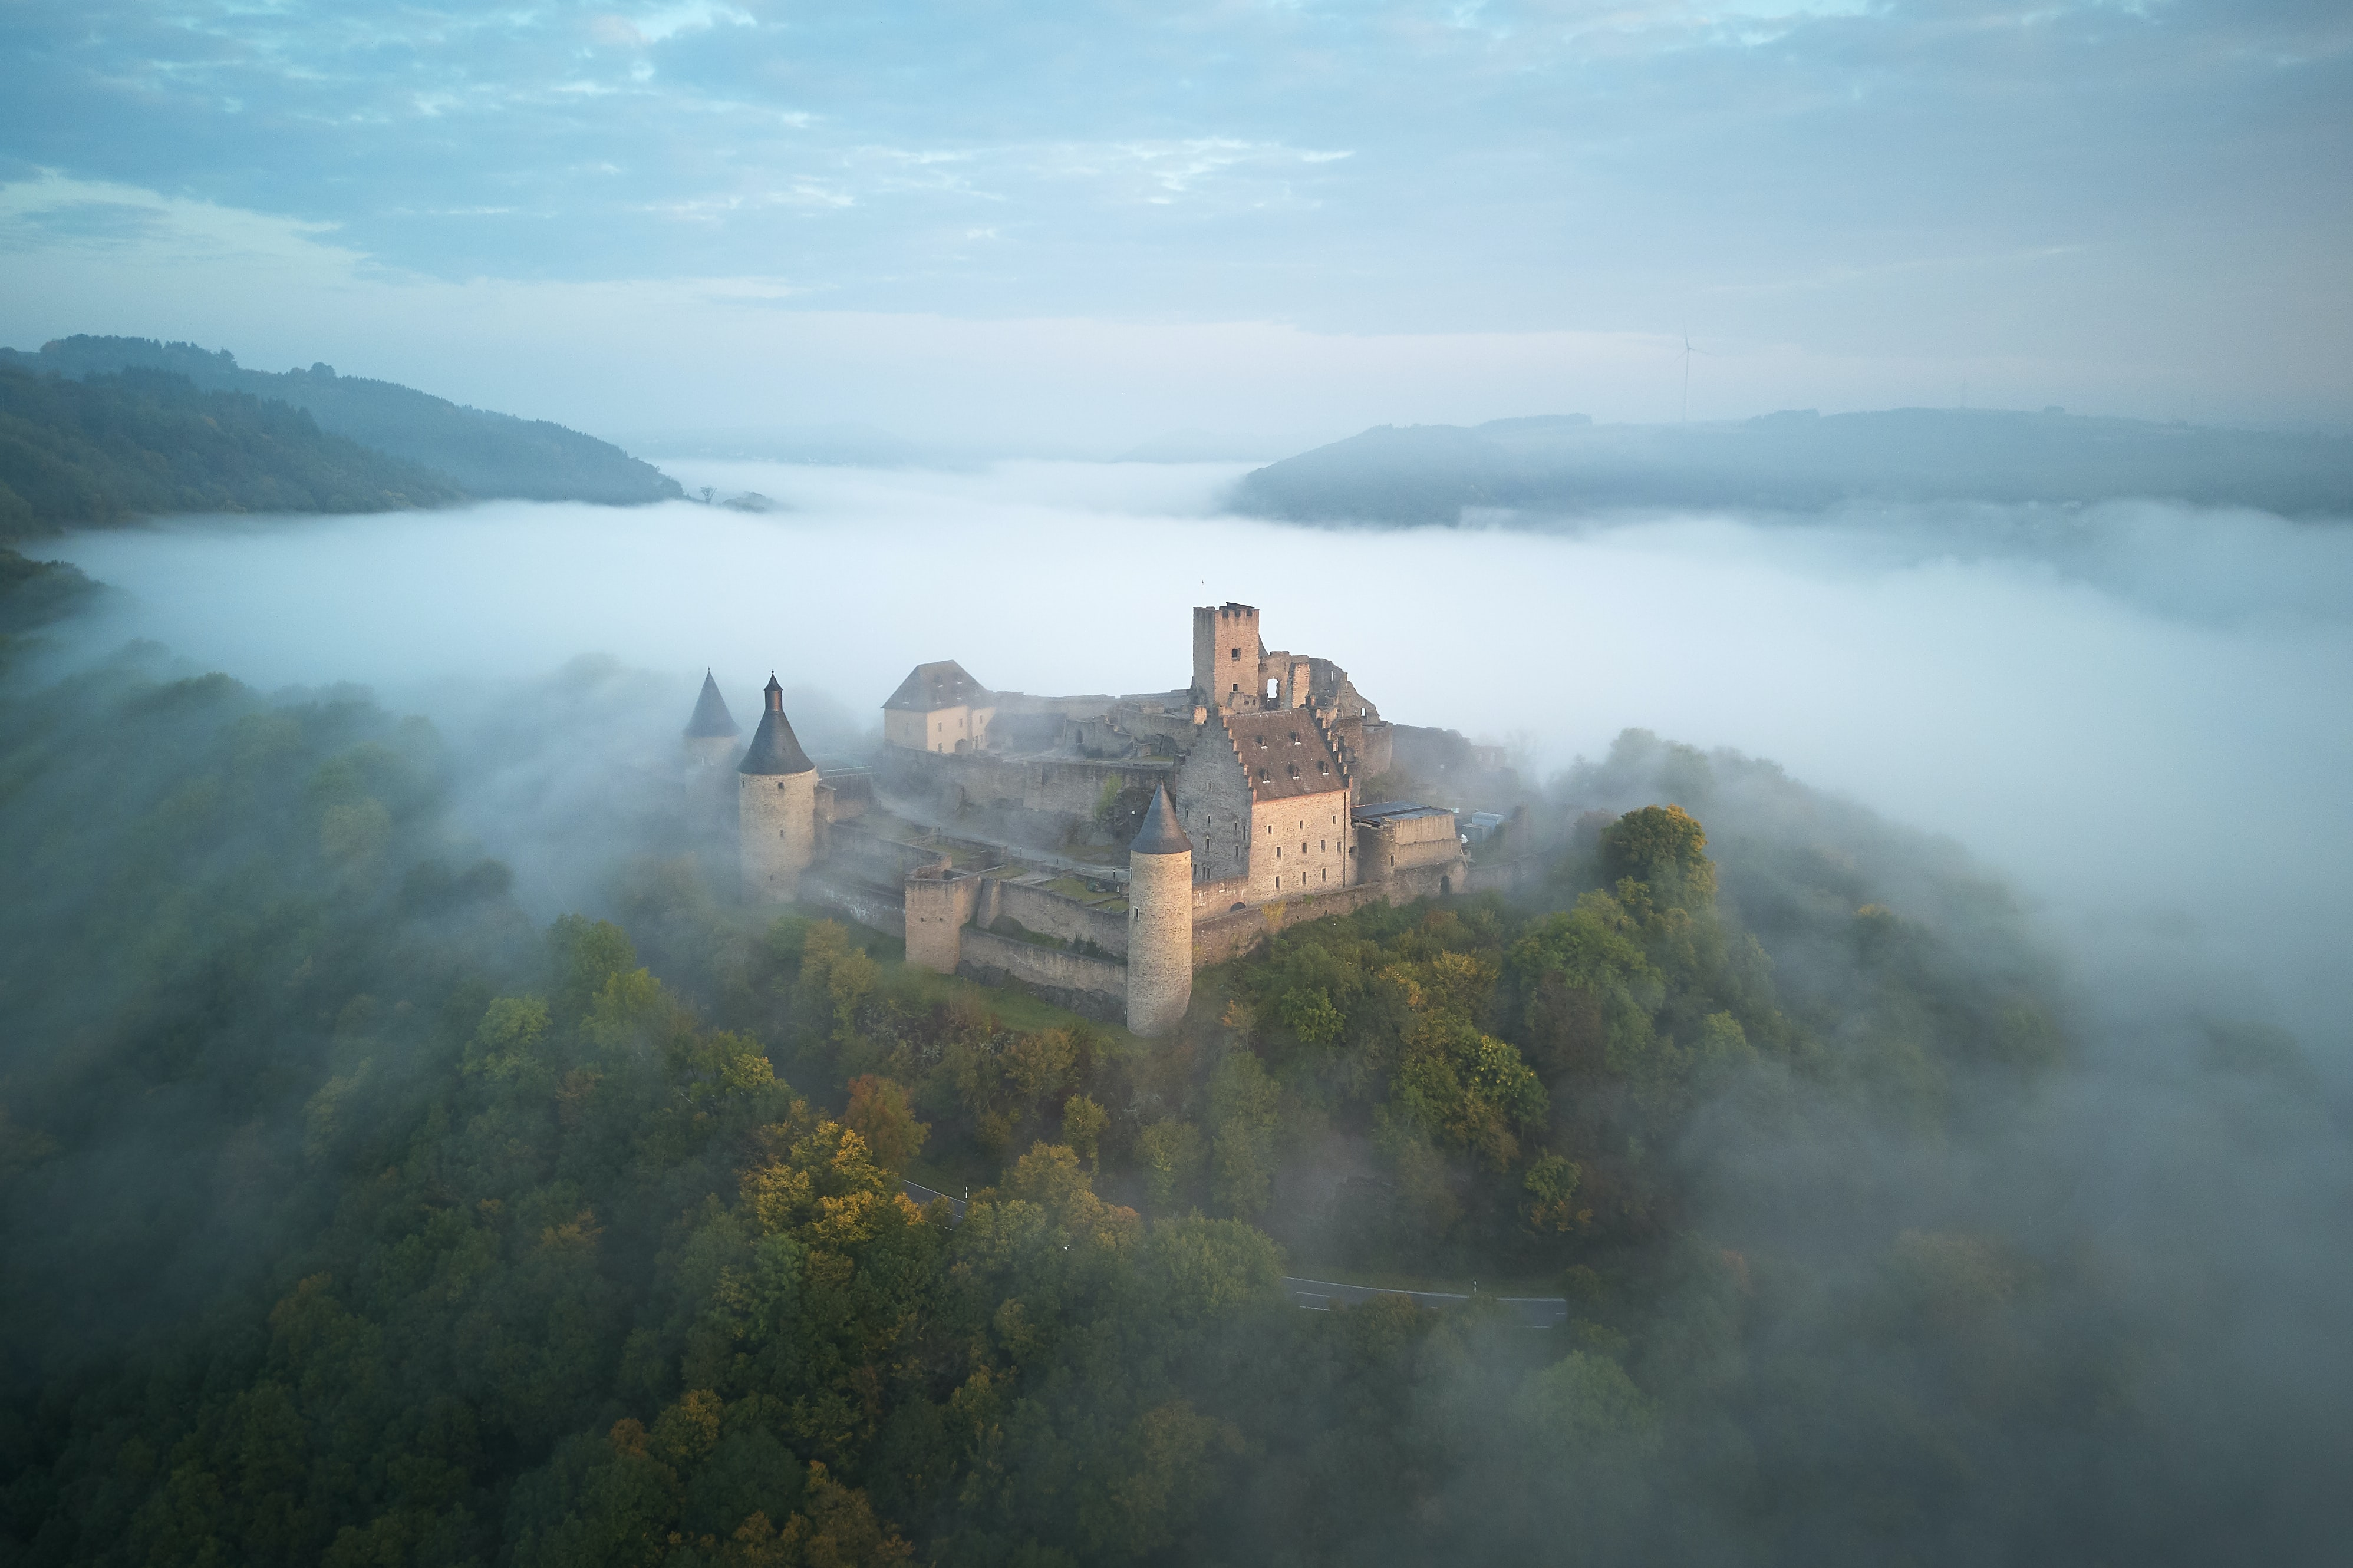 celestial castle